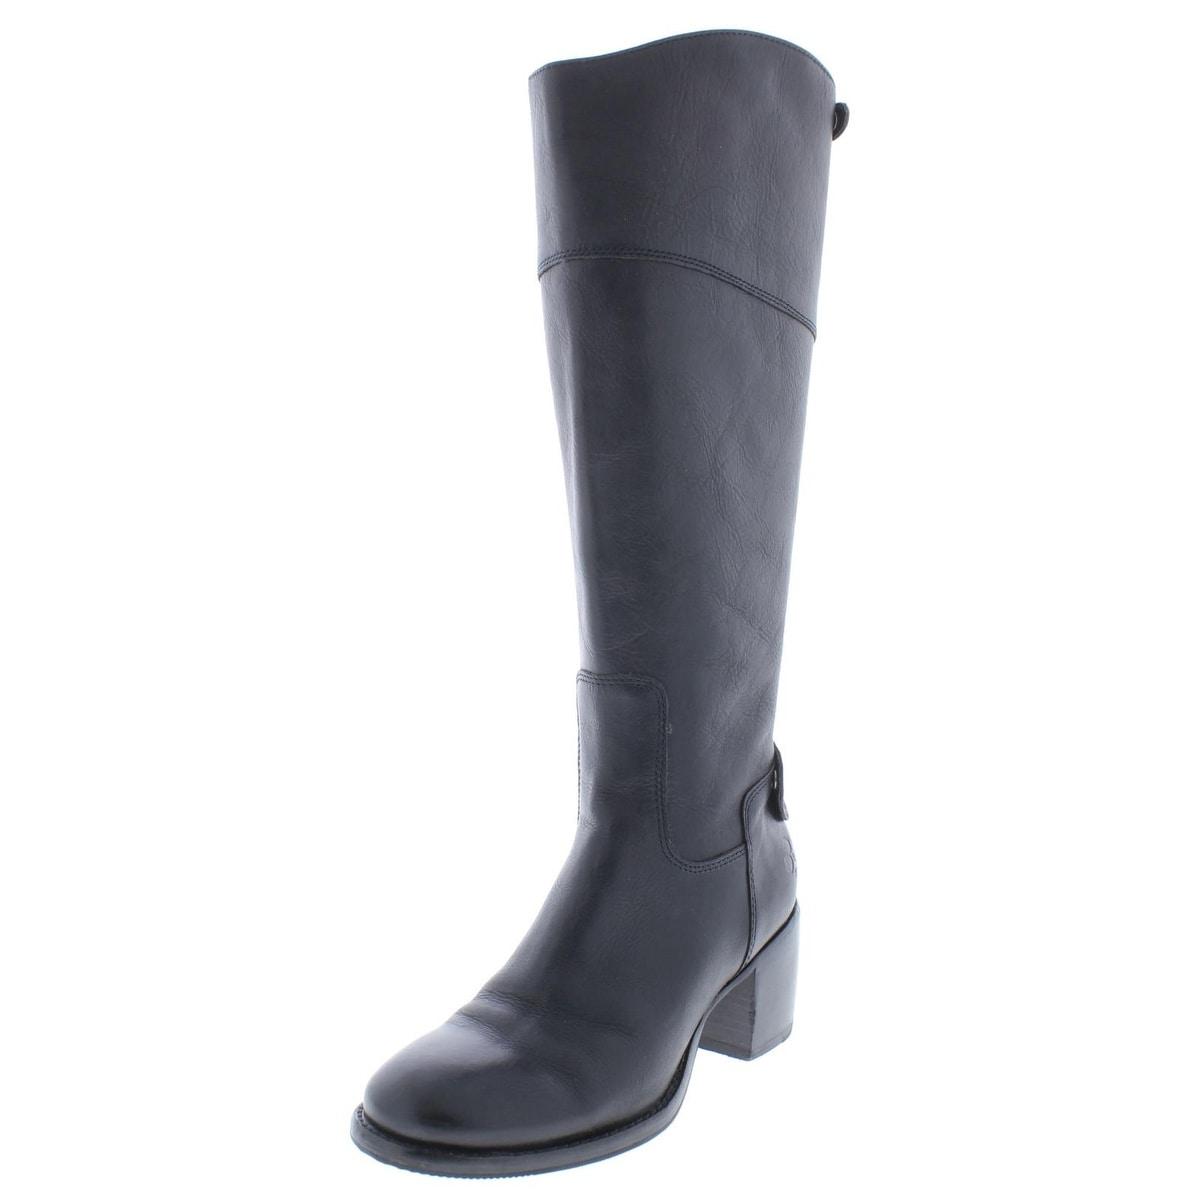 d135927d3ce Patricia Nash Womens Loretta Riding Boots Wide Calf Leather